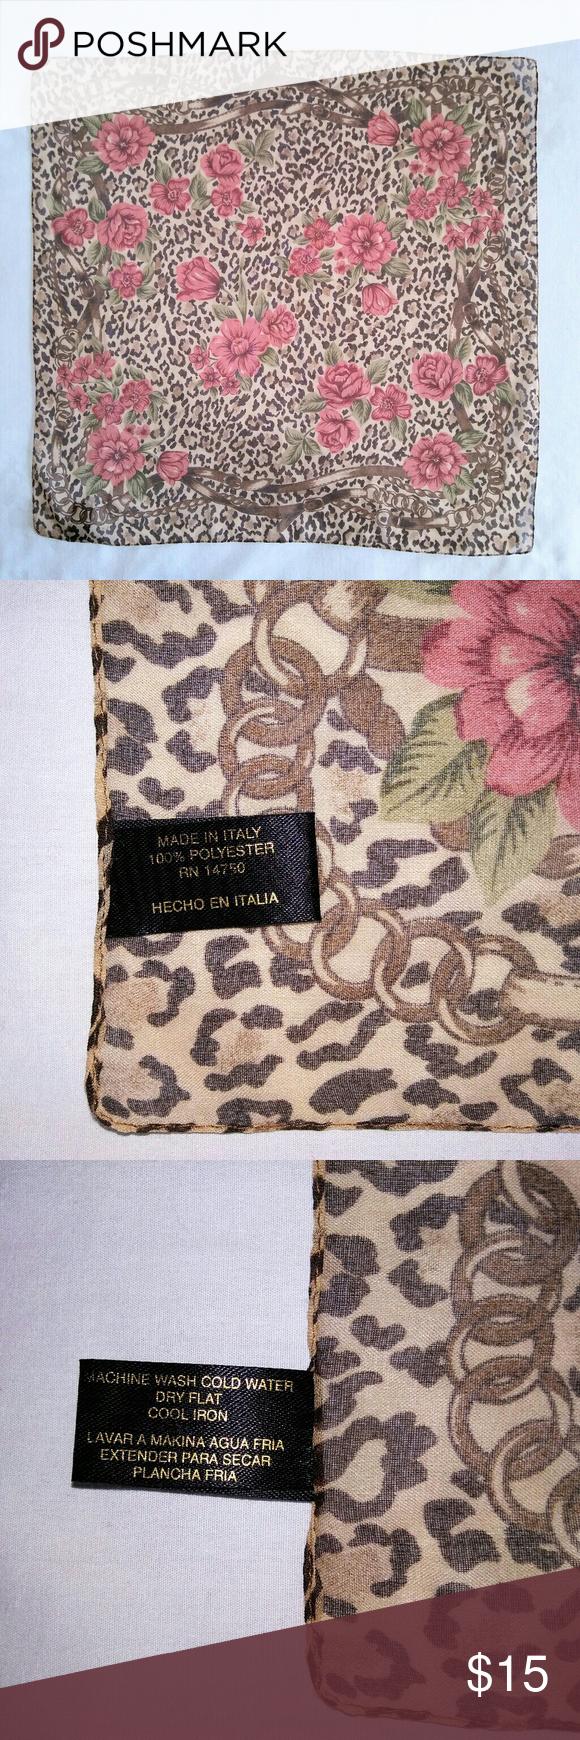 Hundredsofscarves SHEER Animal Print Head Scarf